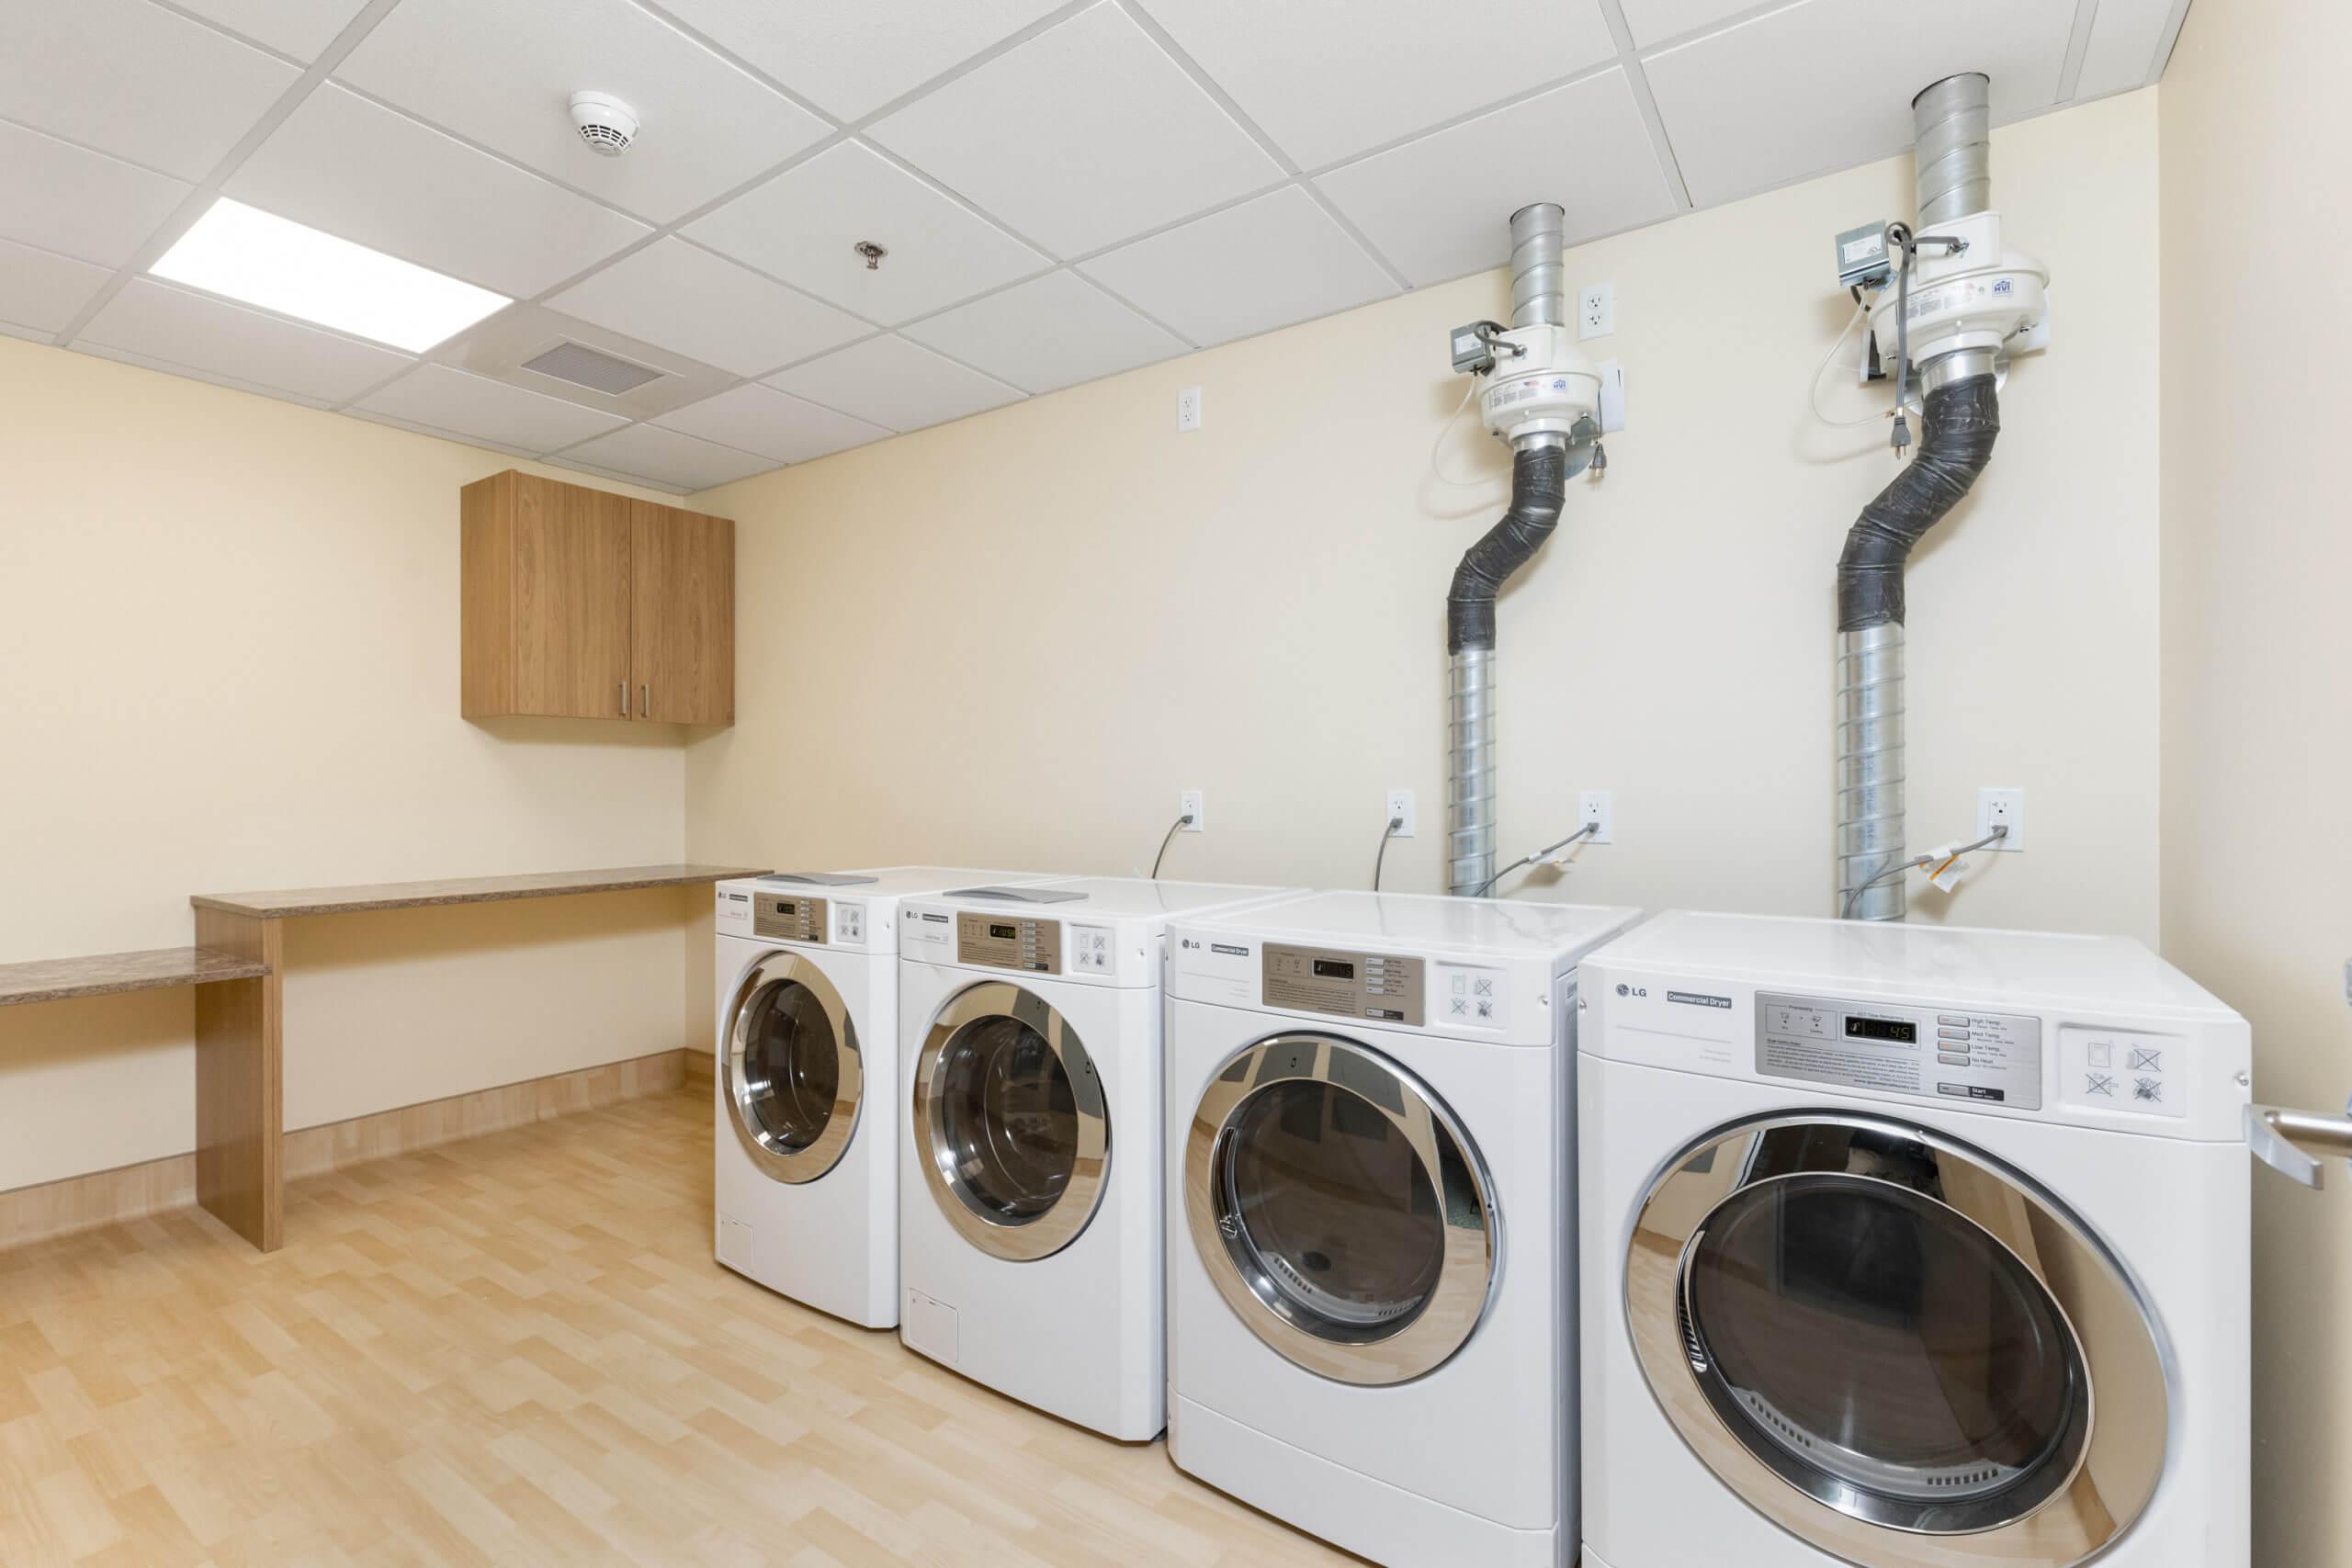 Baxter Senior Living Laundry Room